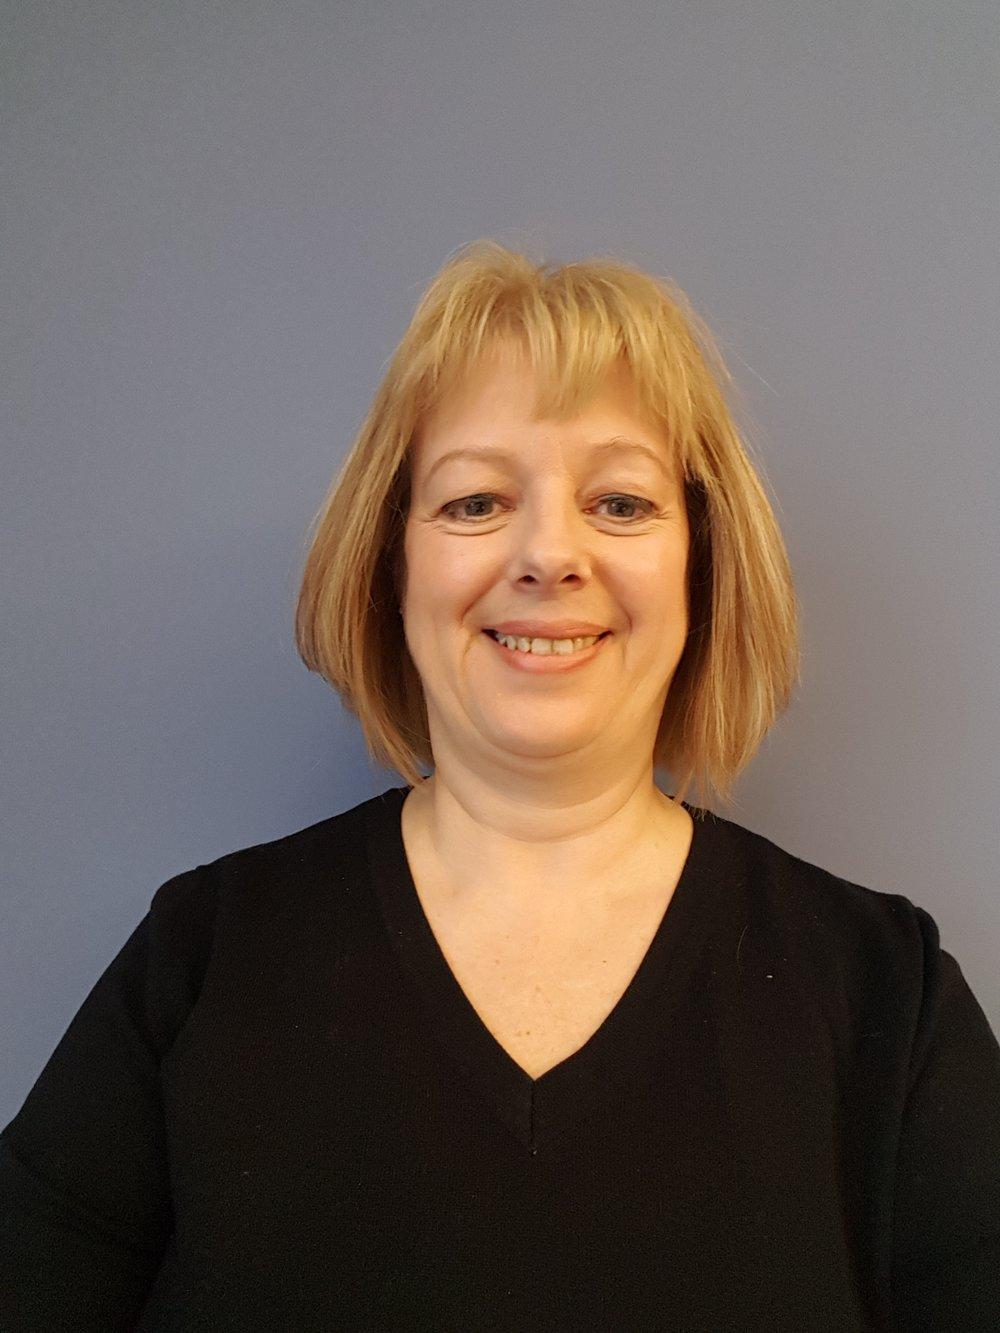 Cindy Skovgaard